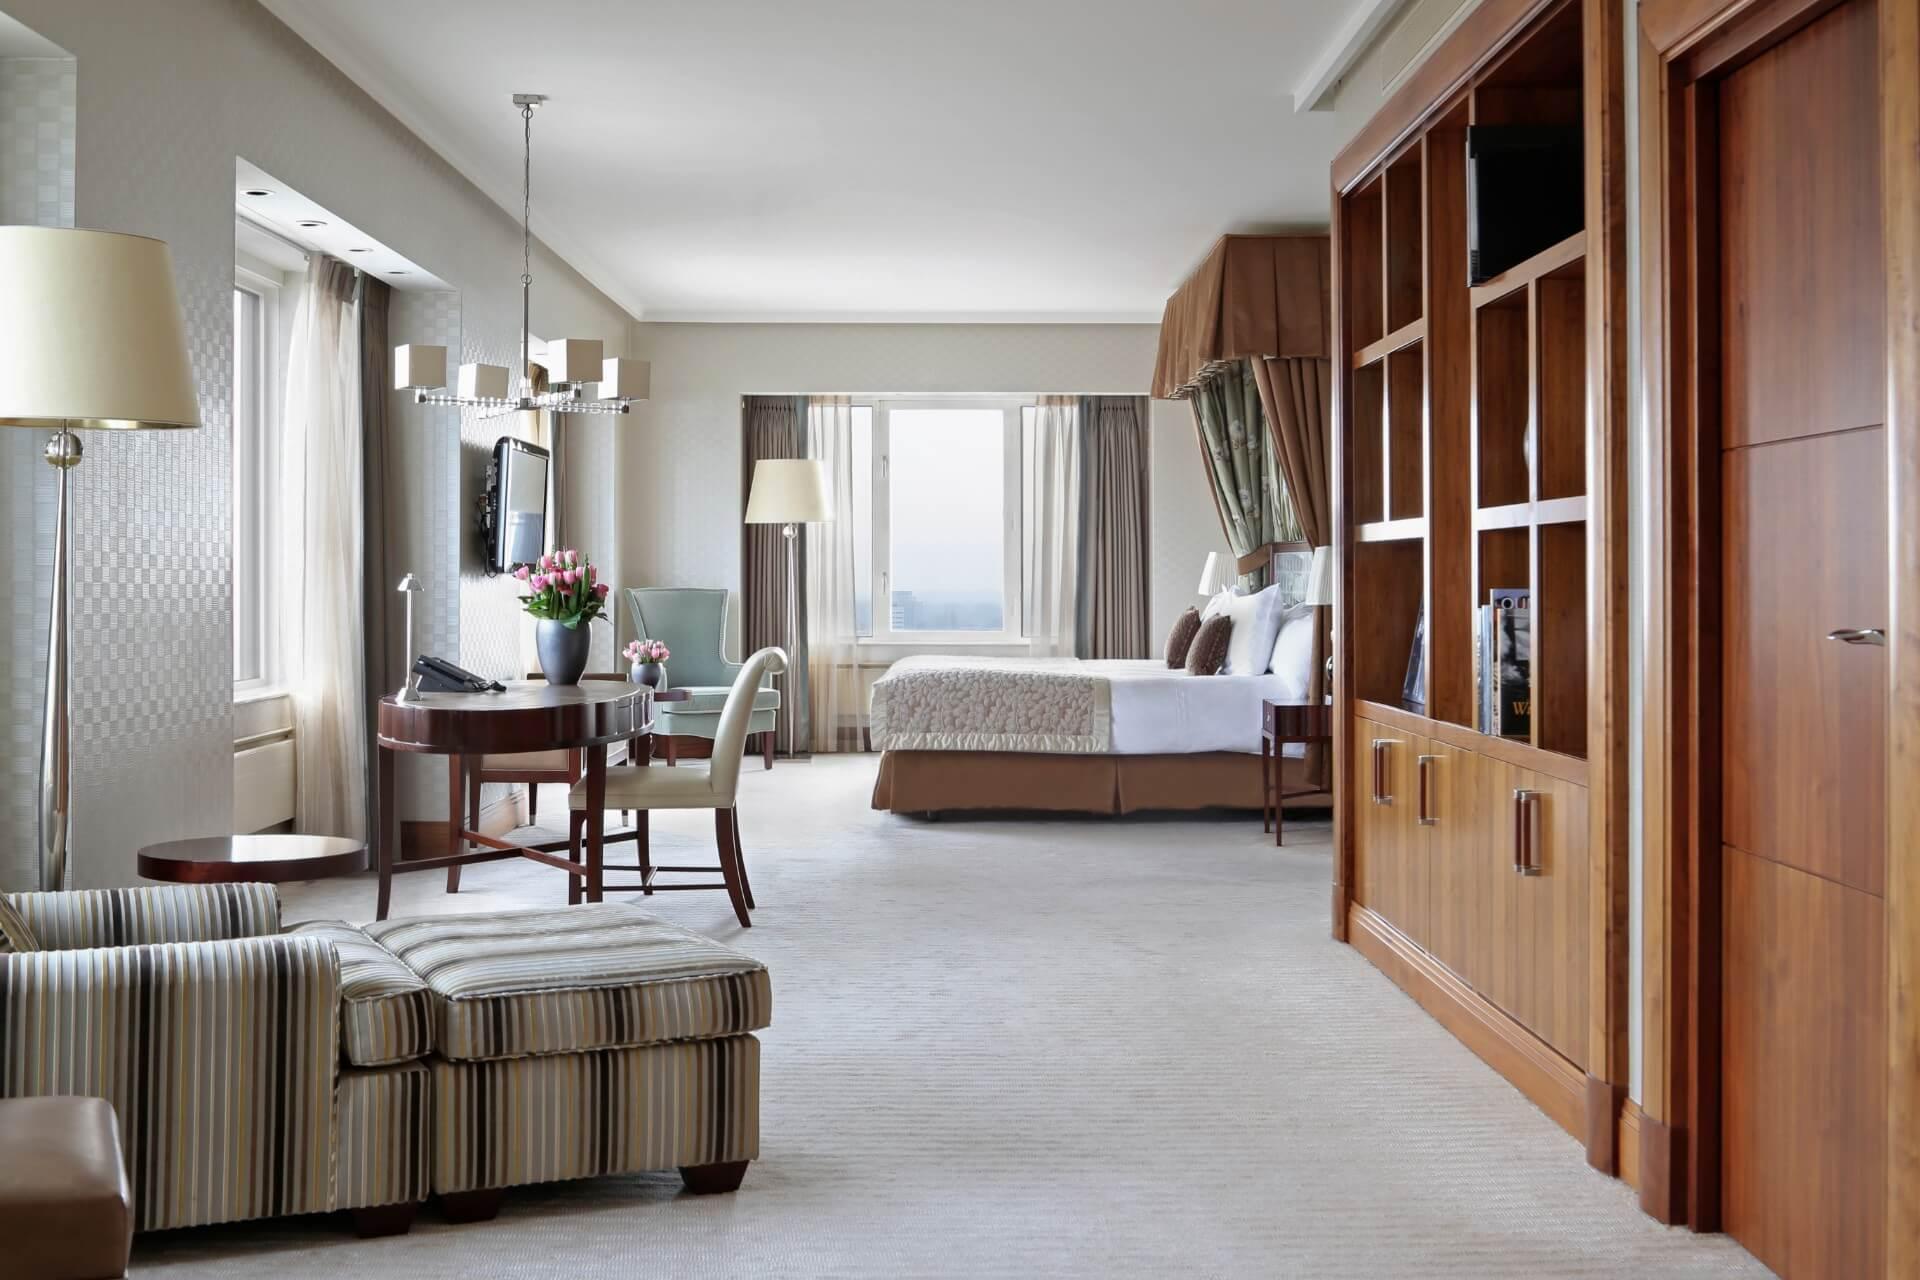 empress-bedroom-the-imperial-suite-hotel-okura-amsterdam